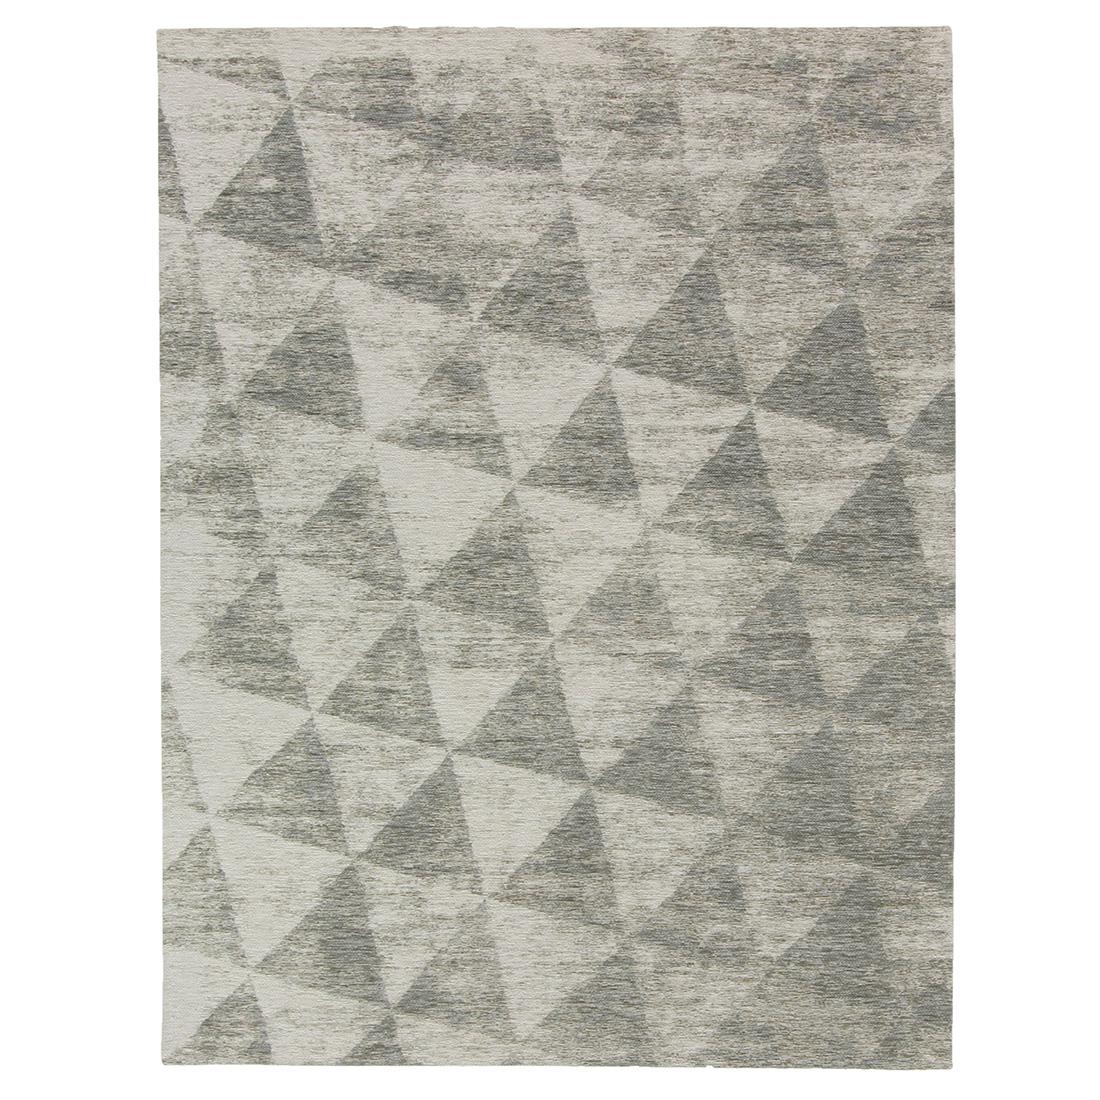 Vloerkleed Brinker Geometrics Coates Grey | 170 x 230 cm